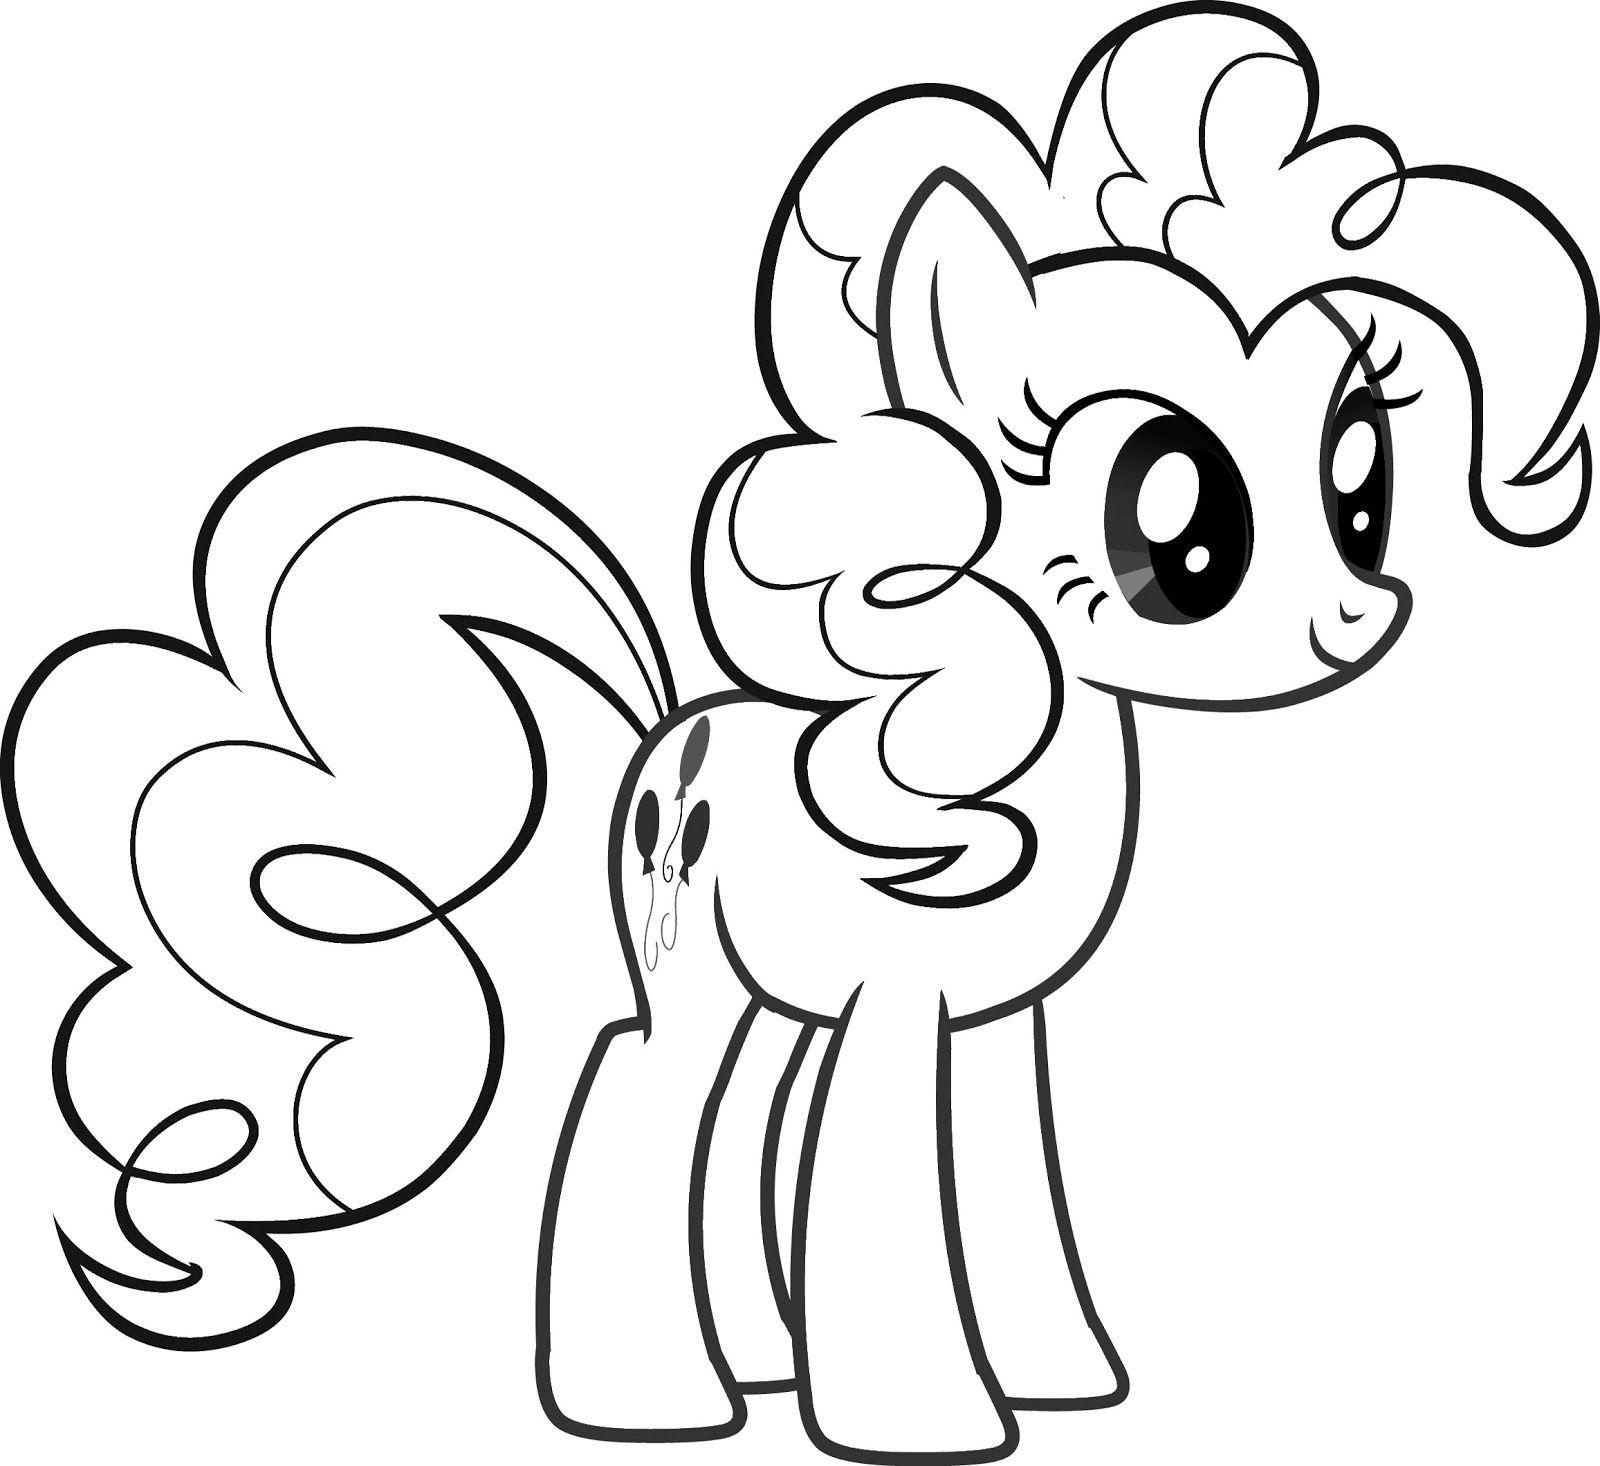 19 Gambar Mewarnai My Little Pony My Little Pony Kuda Poni